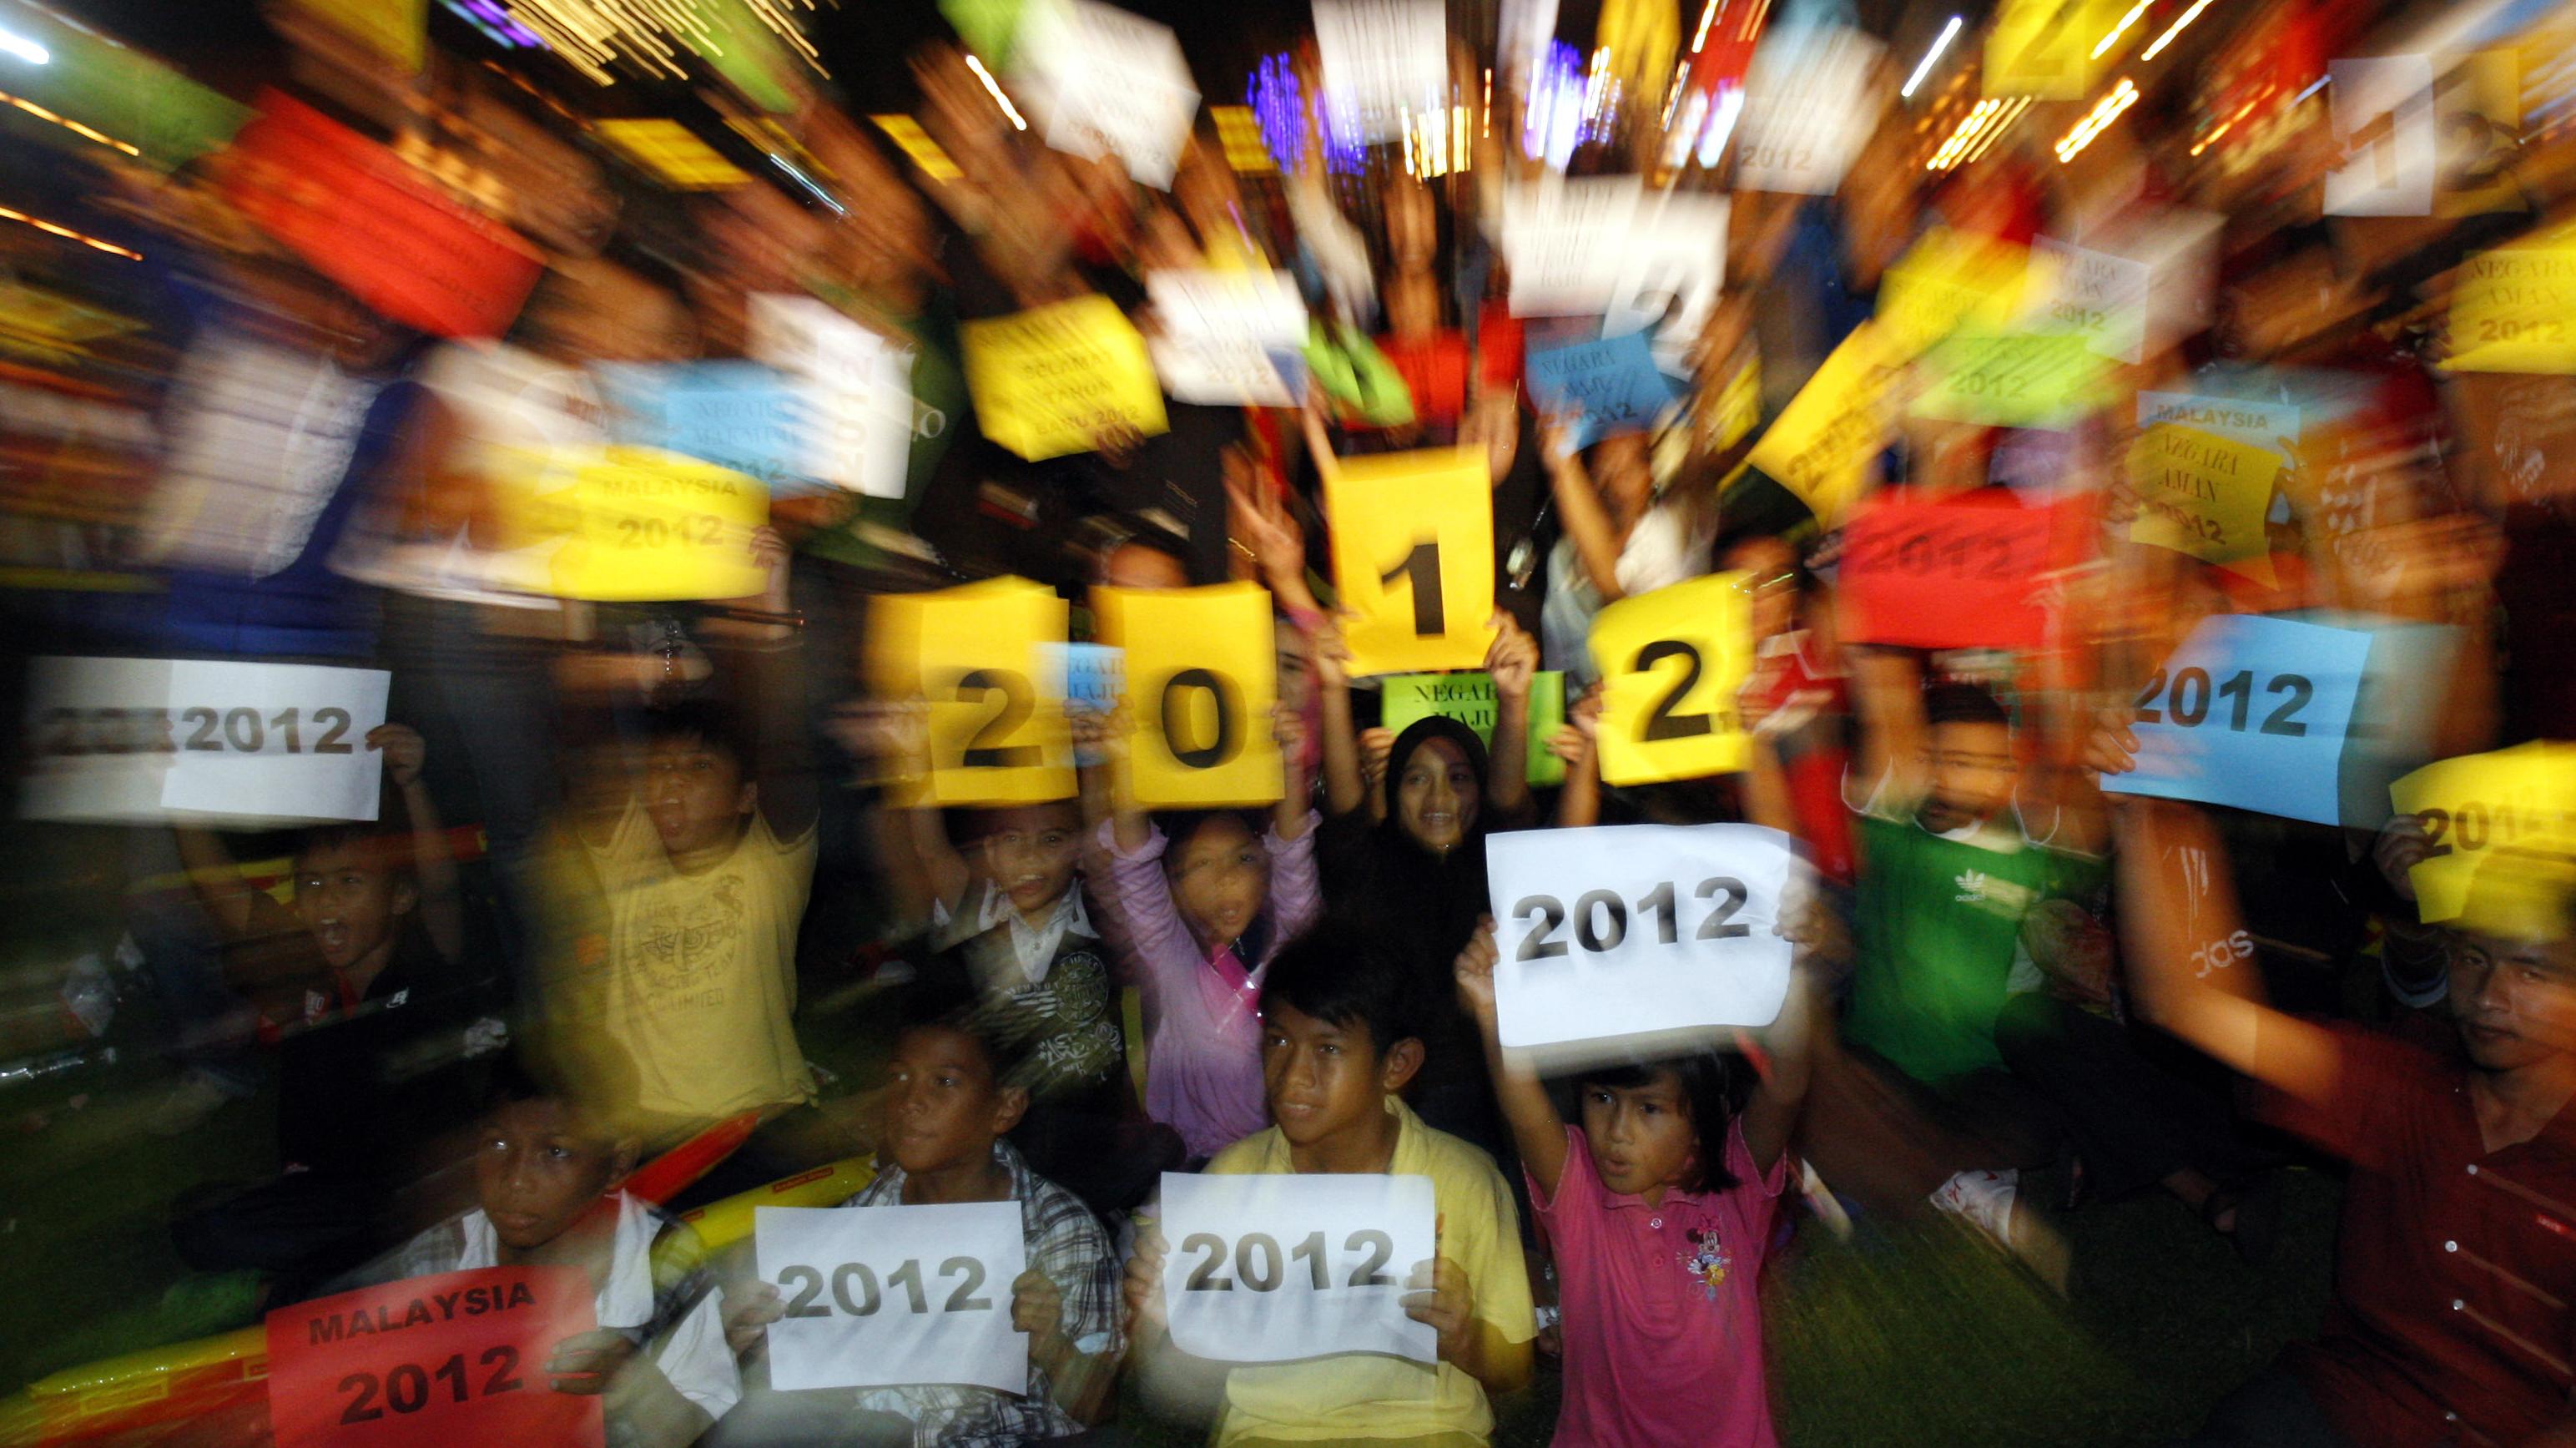 malaysia new year's celebration 2012